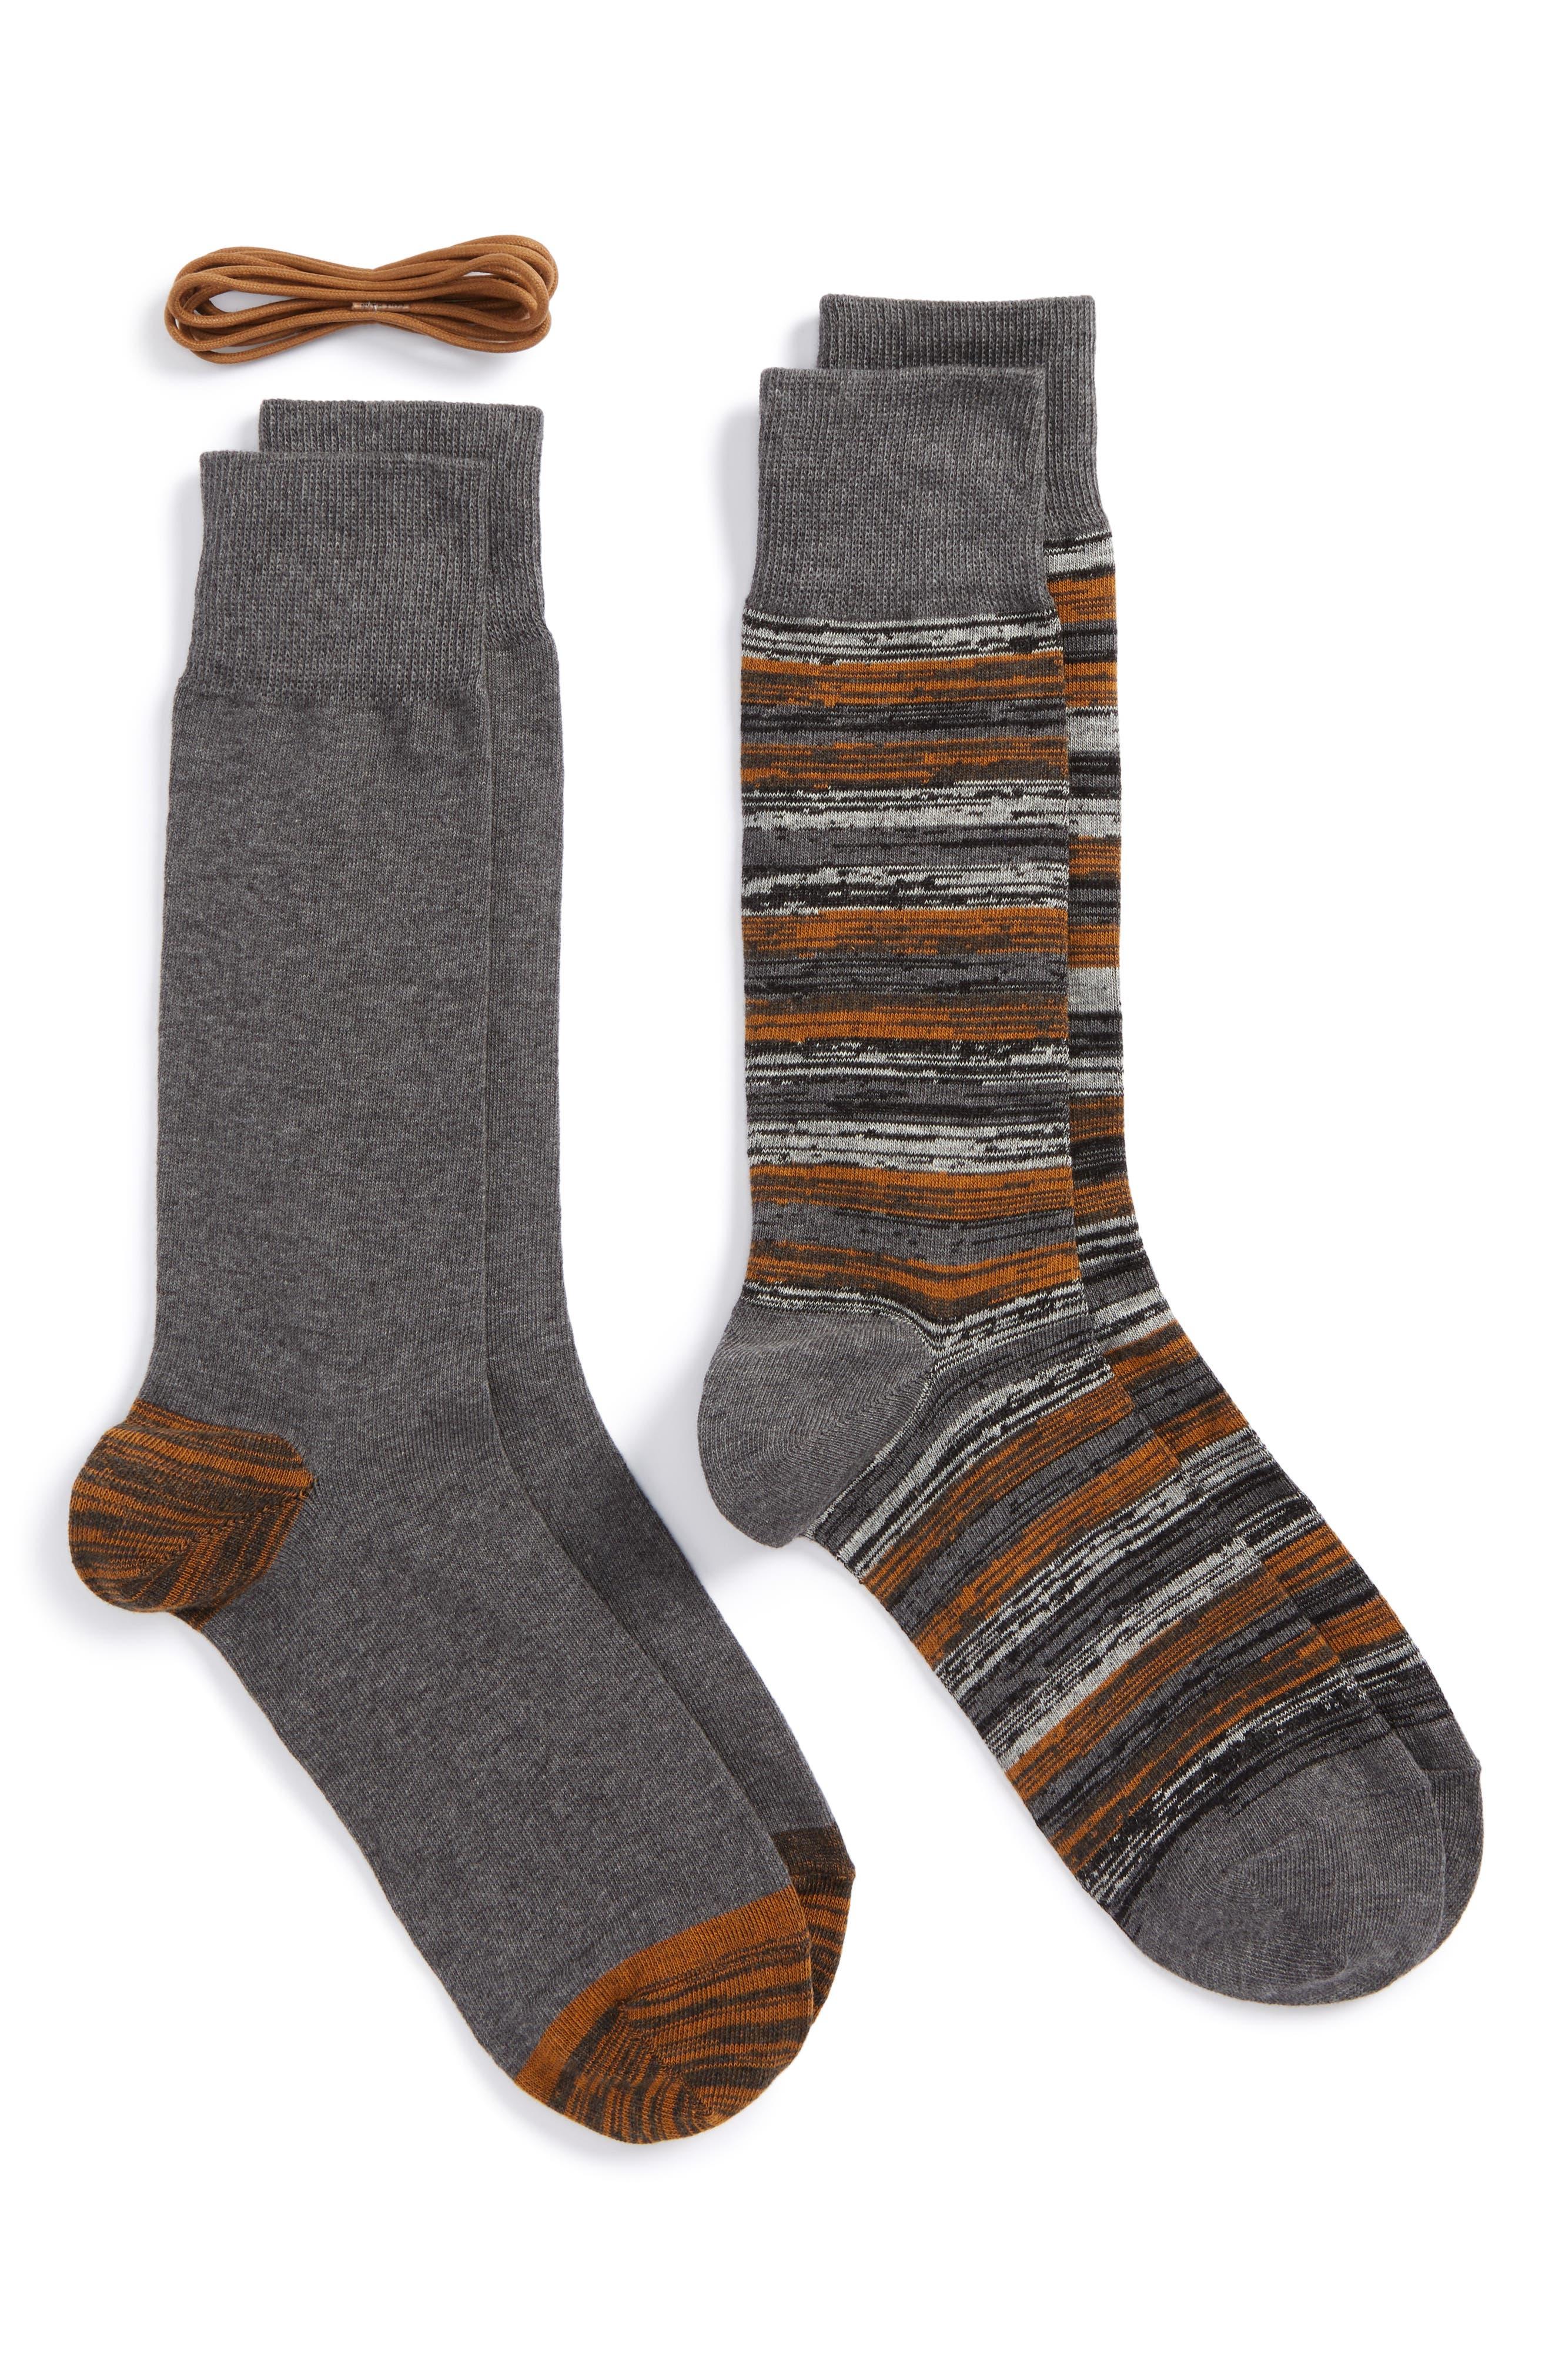 Cole Haan 2-Pack Socks & Laces Set ($31.95 Value)